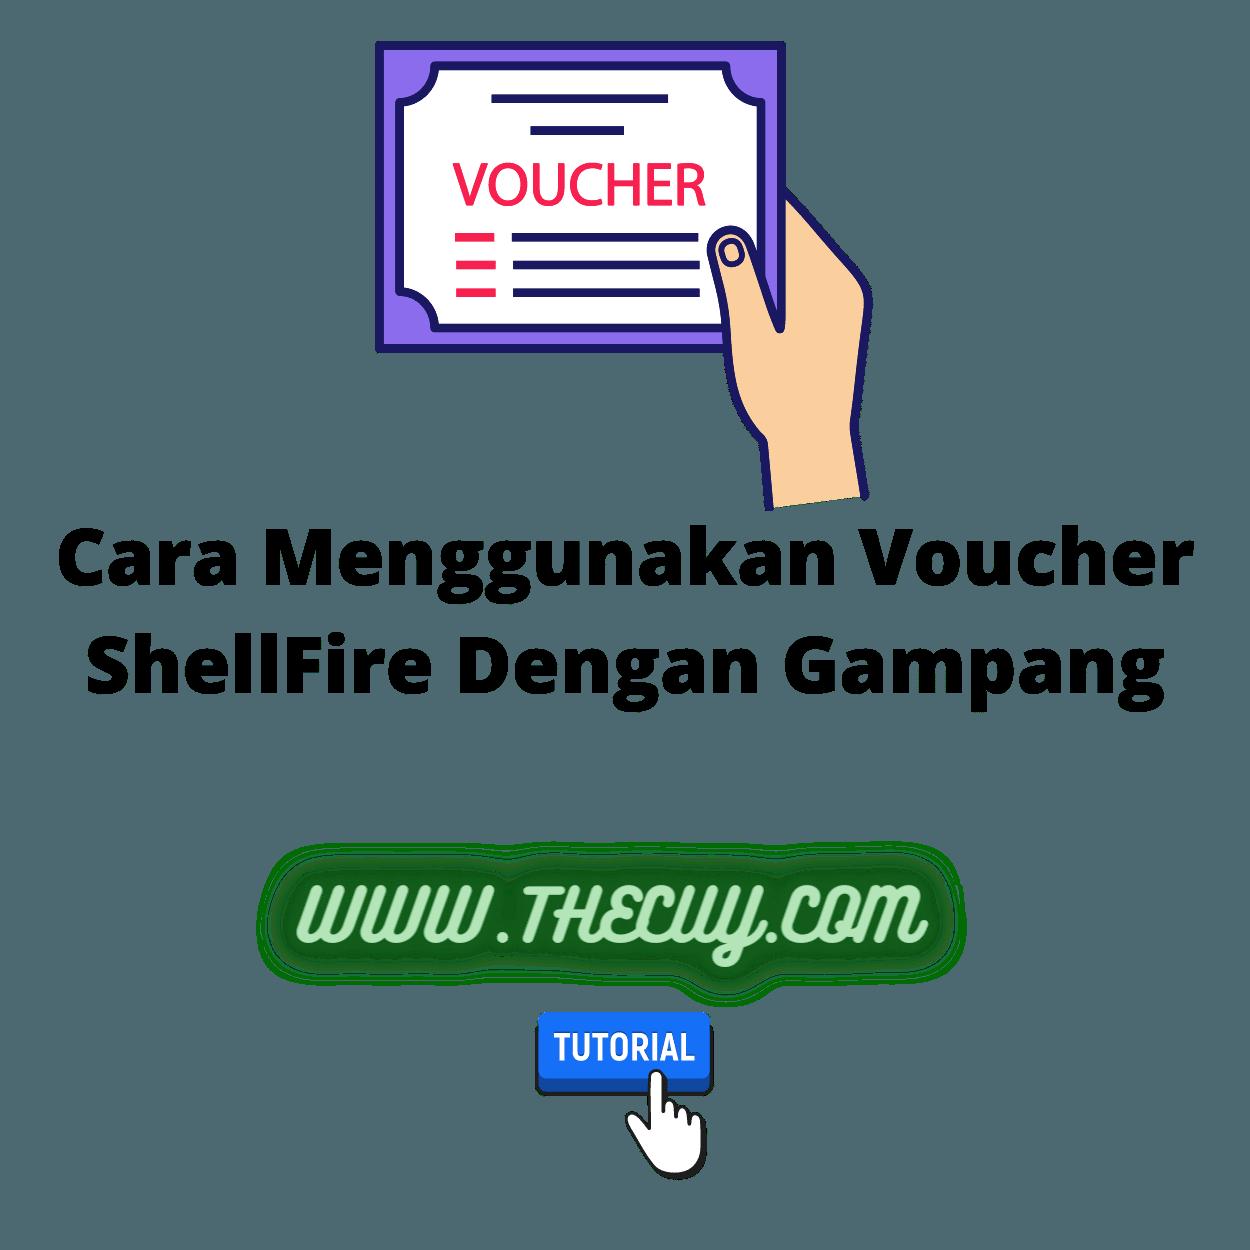 Cara Menggunakan Voucher ShellFire Dengan Gampang